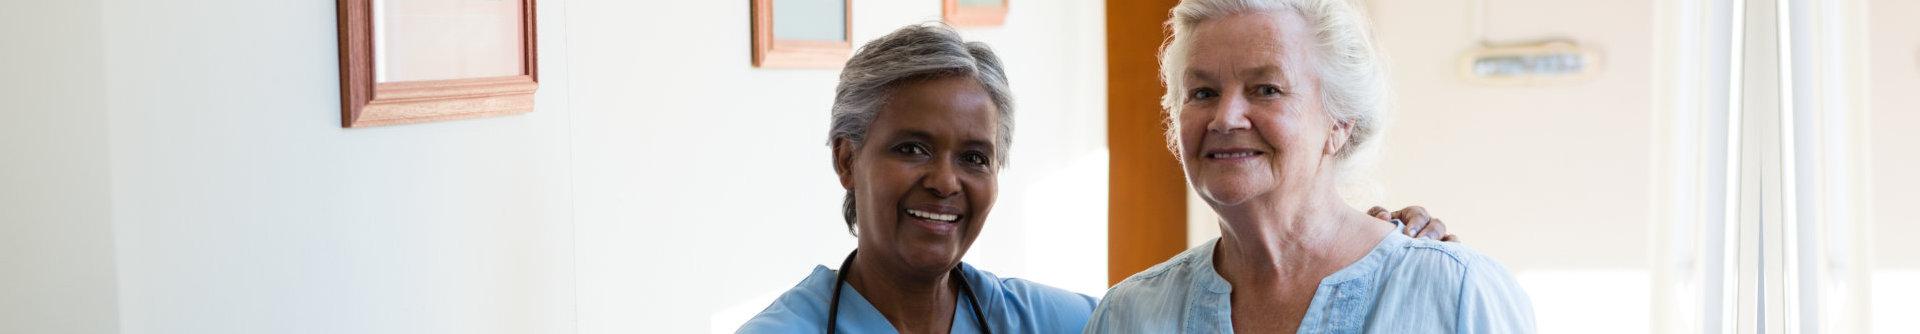 nurse and elder woman smiling